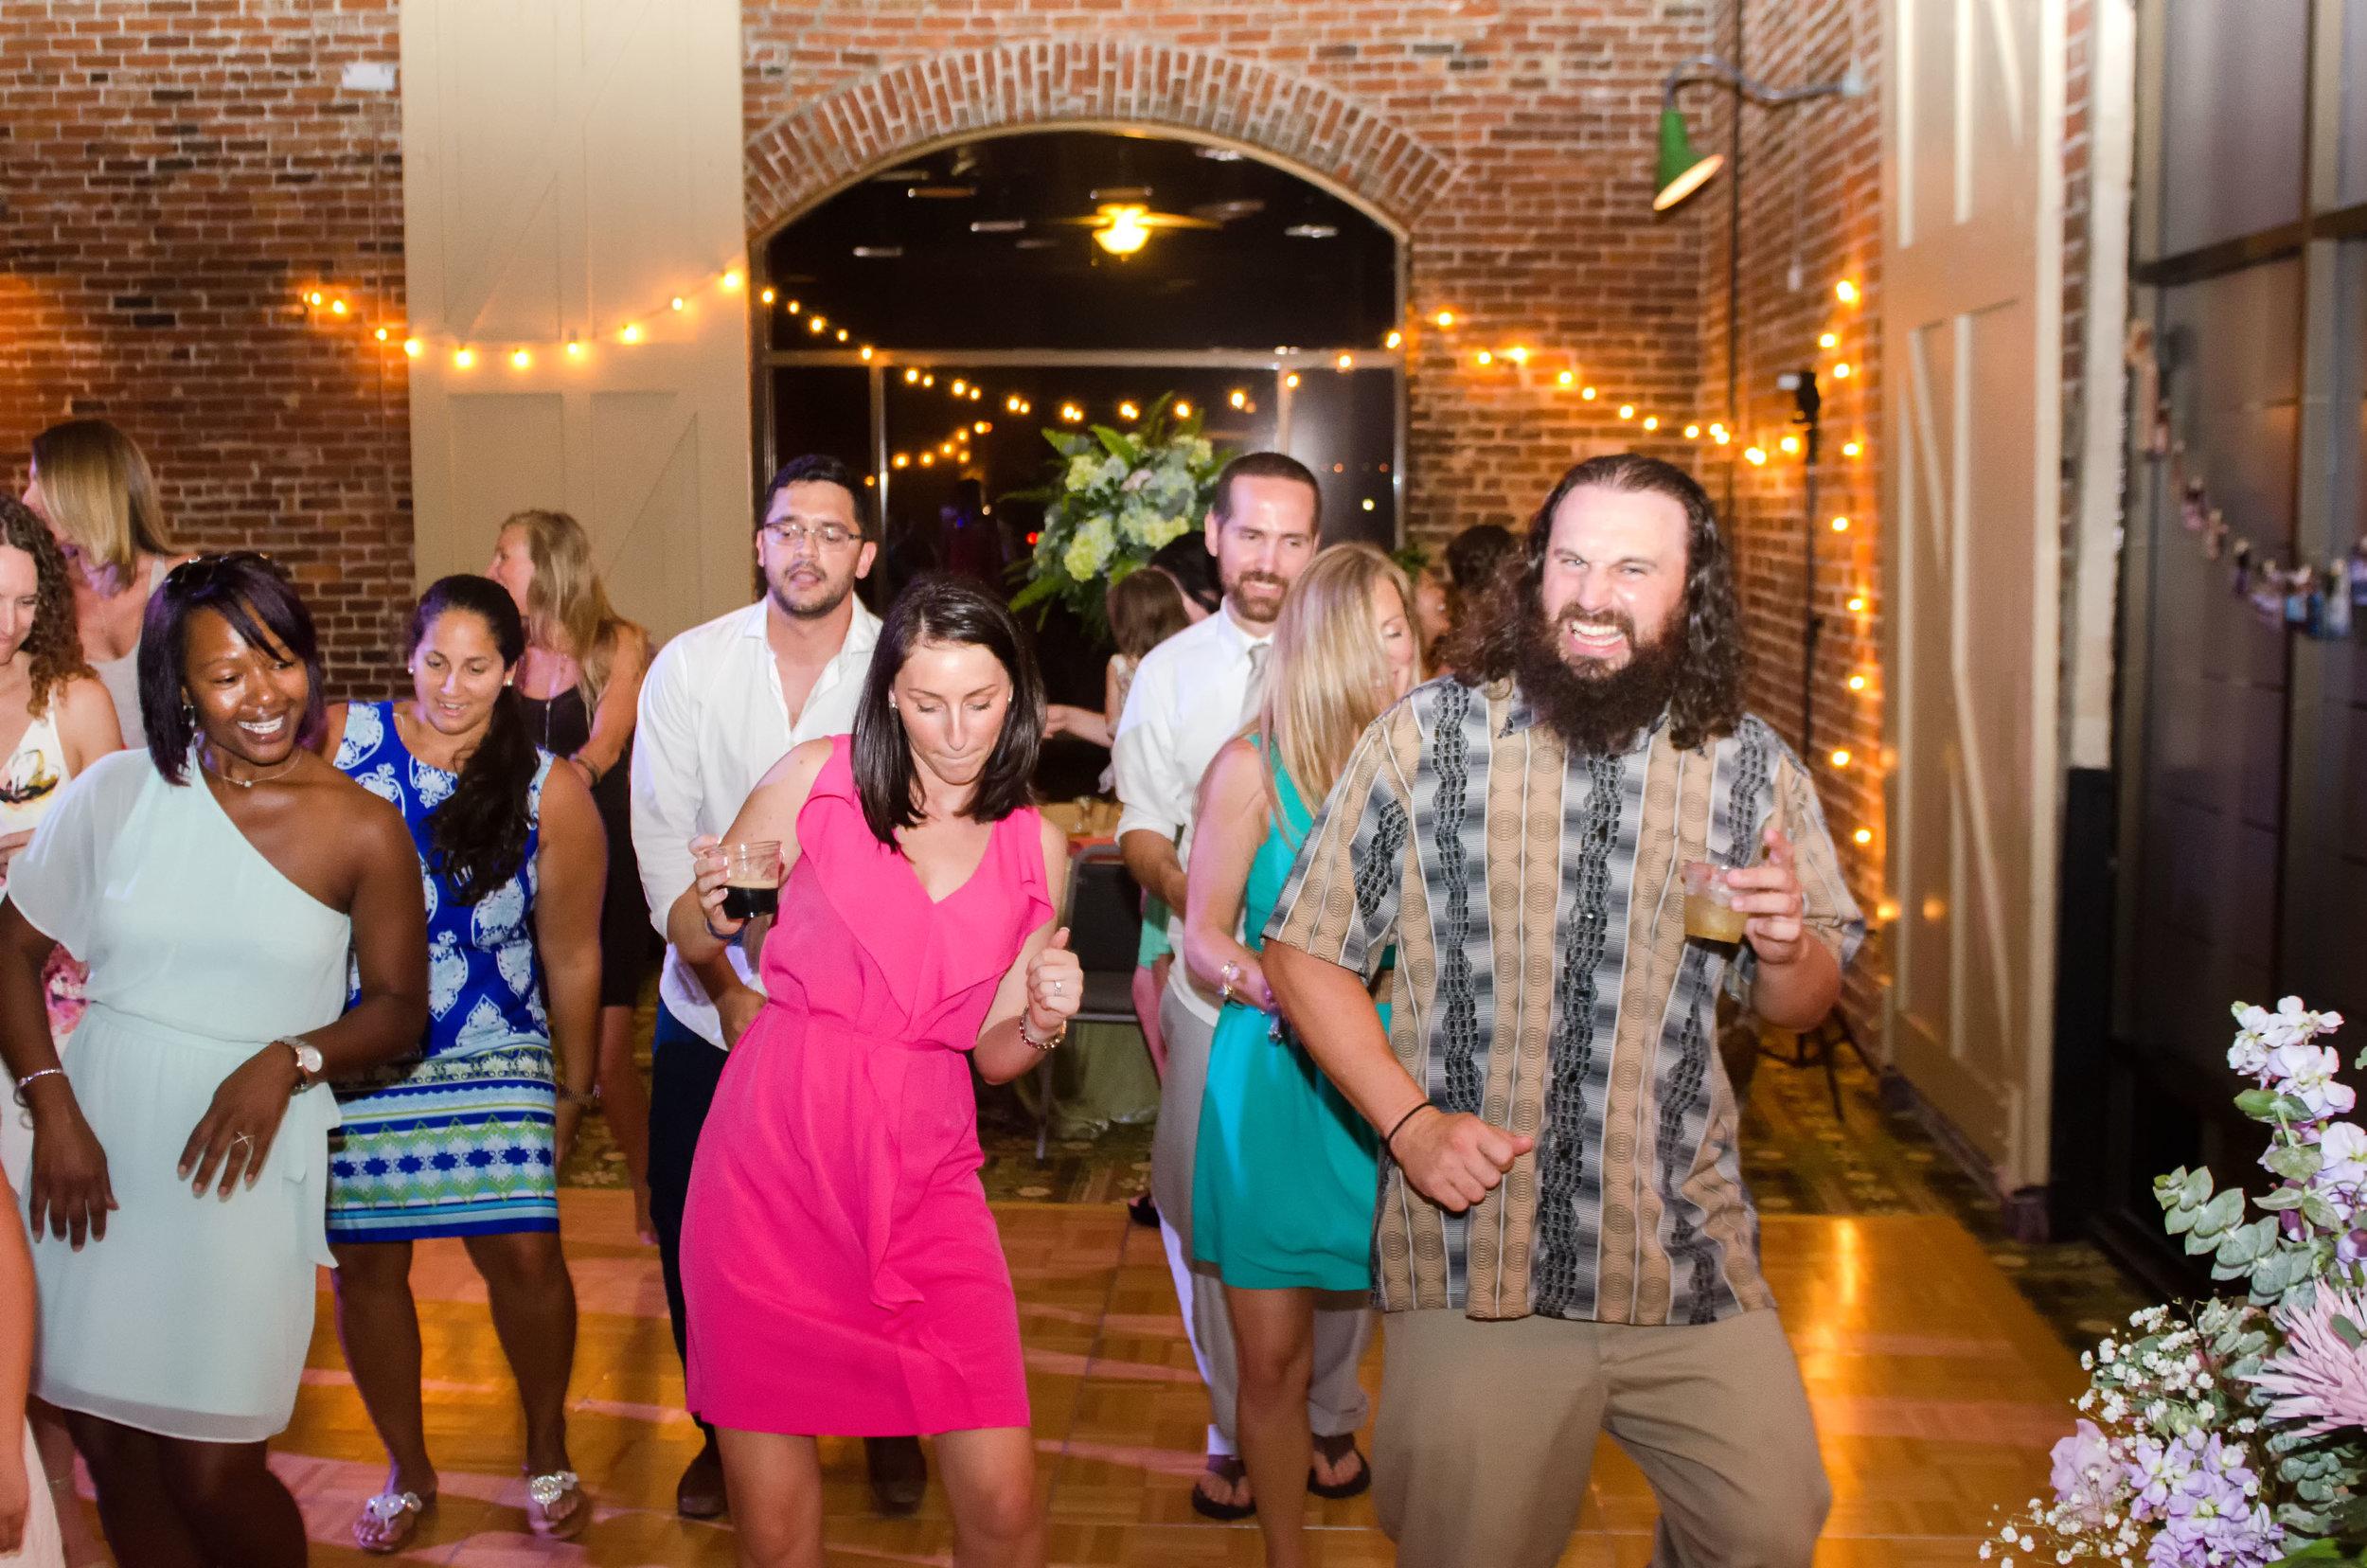 North_Carolina_Wedding_Photographer_Tiffany_Abruzzo_Reception_196.jpg